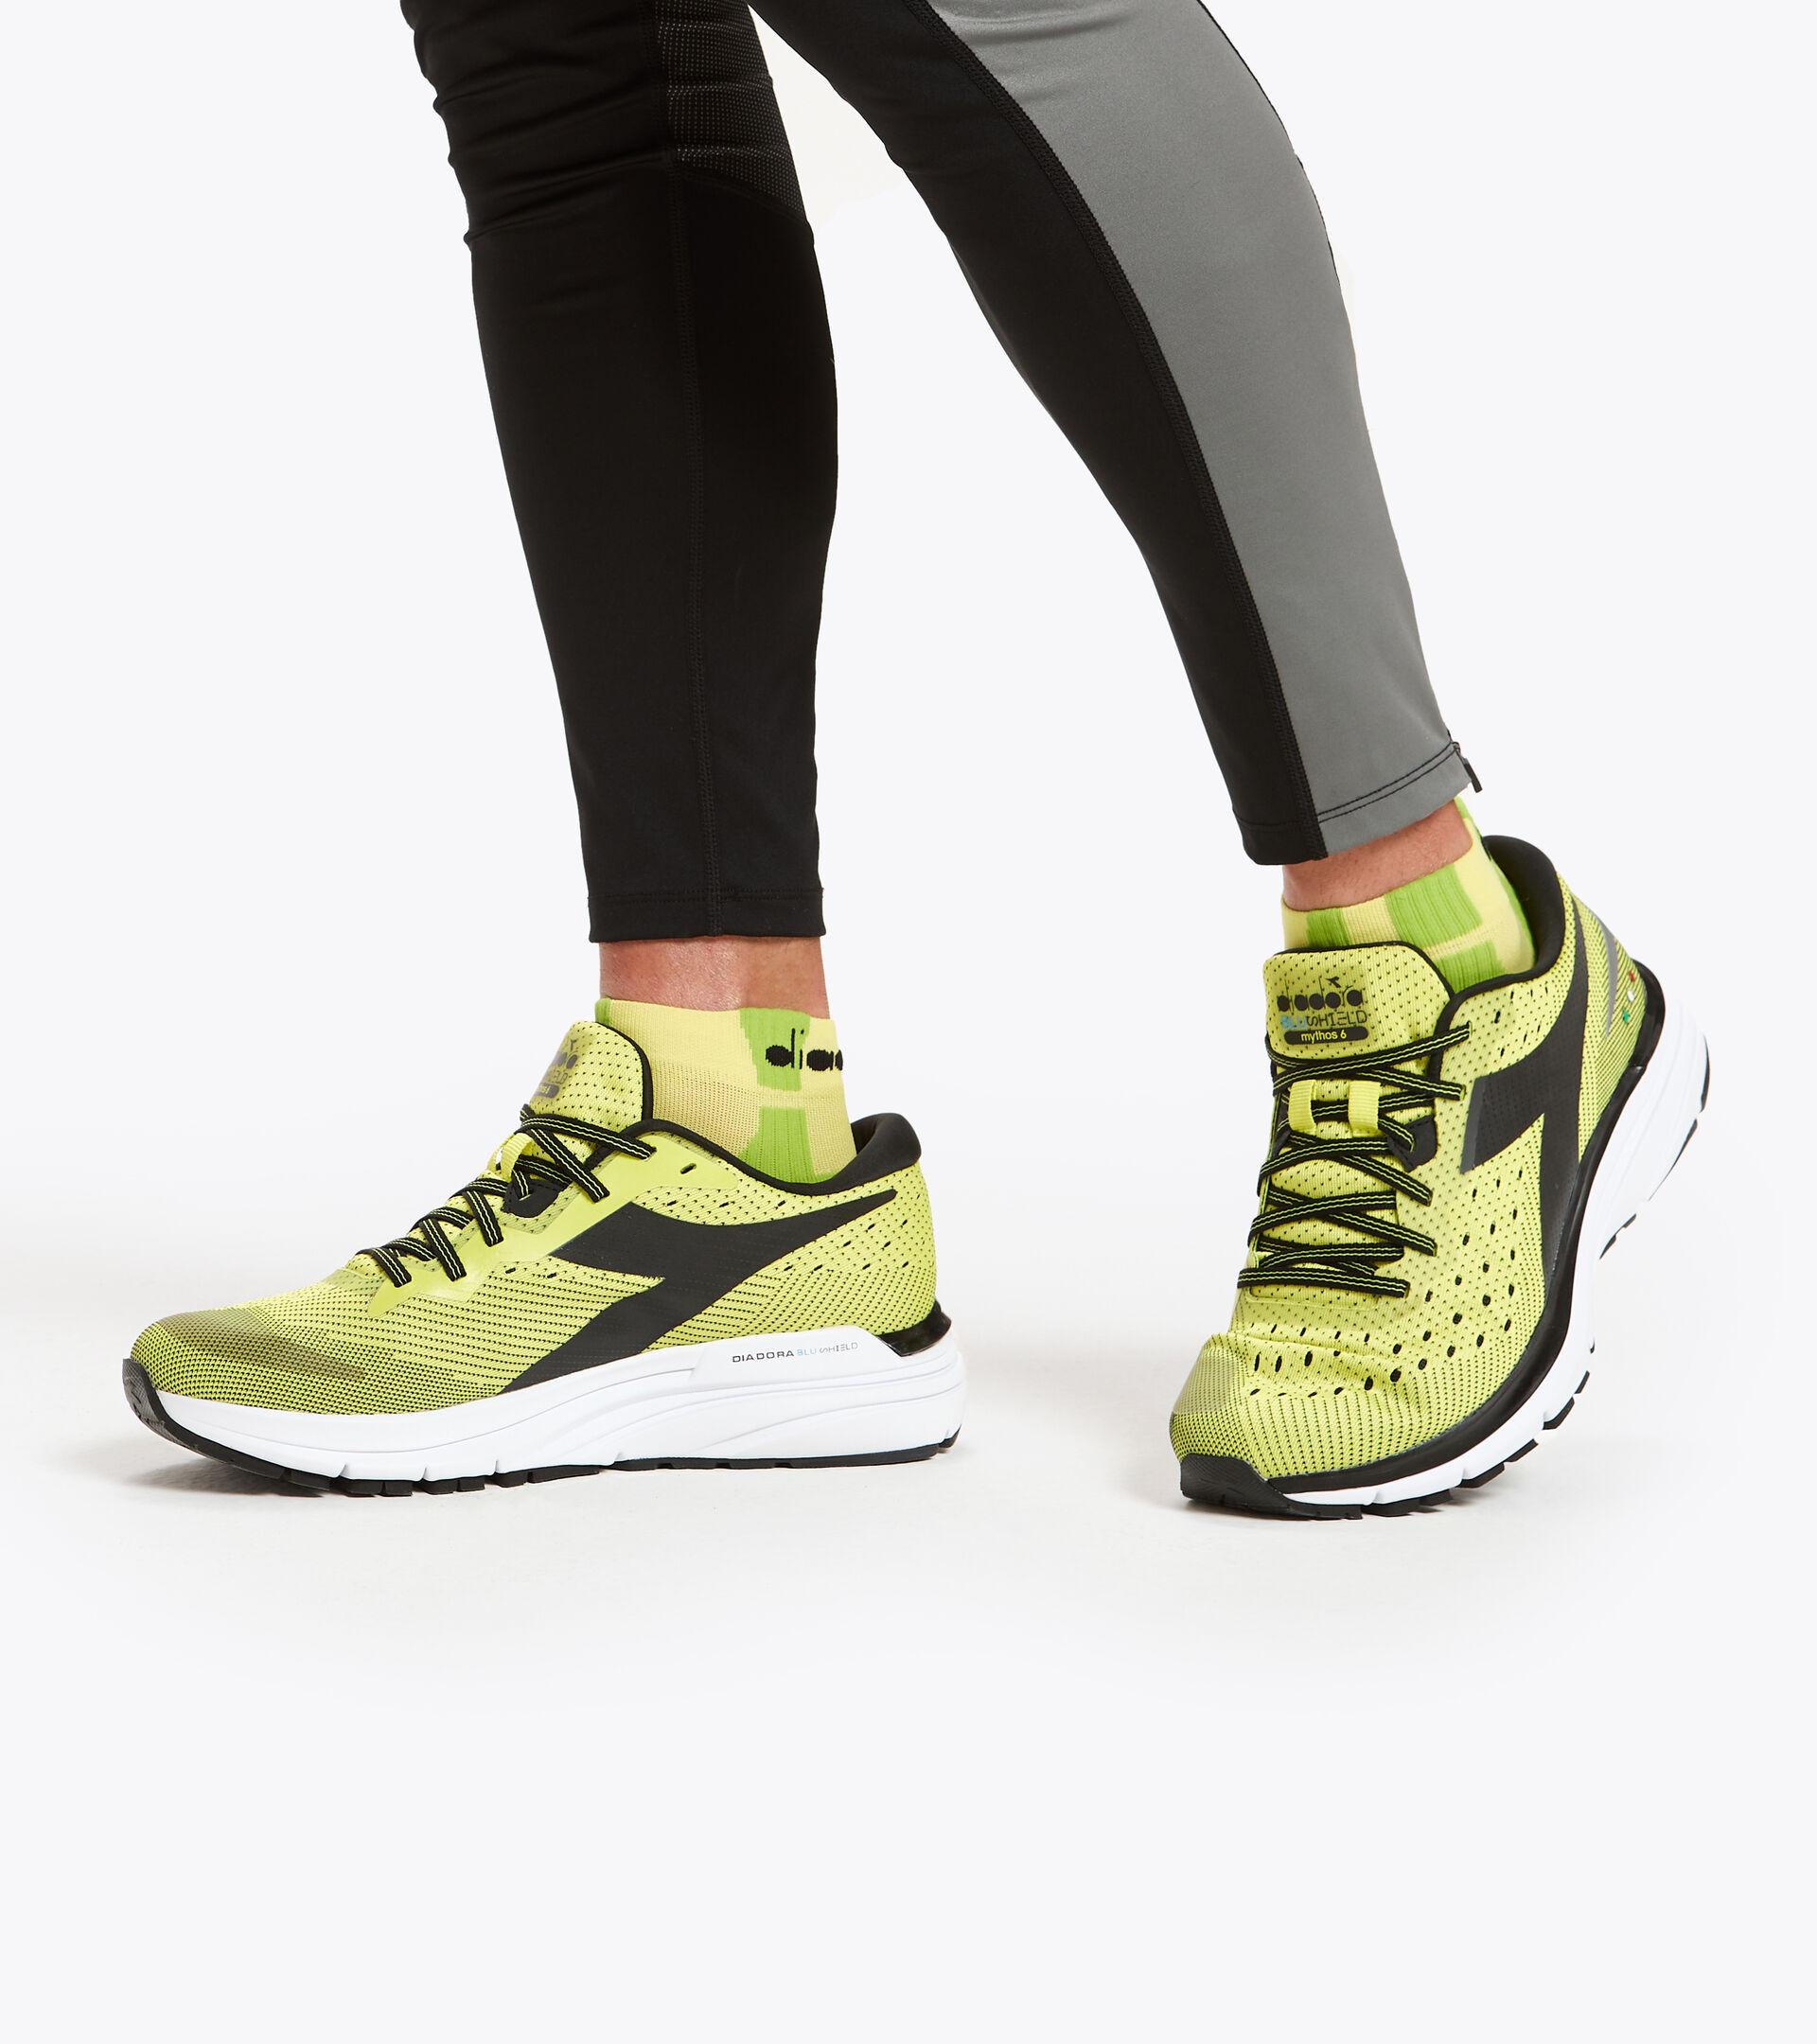 Footwear Sport UOMO MYTHOS BLUSHIELD 6 SULPHUR SPRING/BLACK/WHITE Diadora